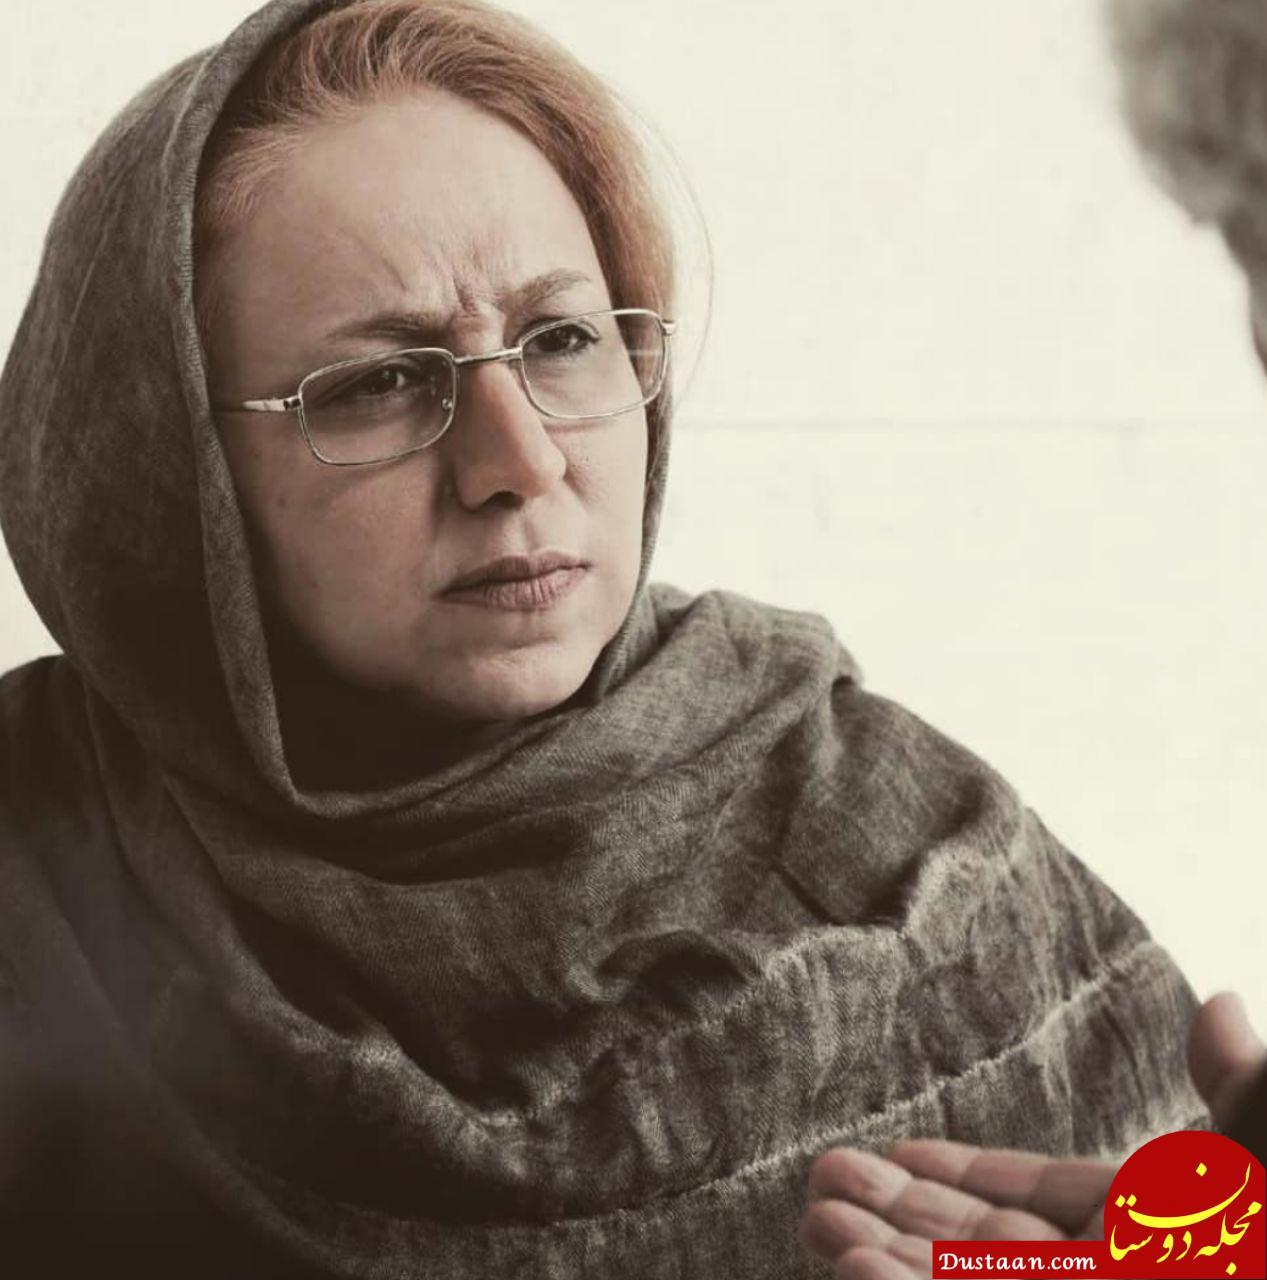 www.dustaan.com گریم عصبانی «بهنوش بختیاری»! +عکس